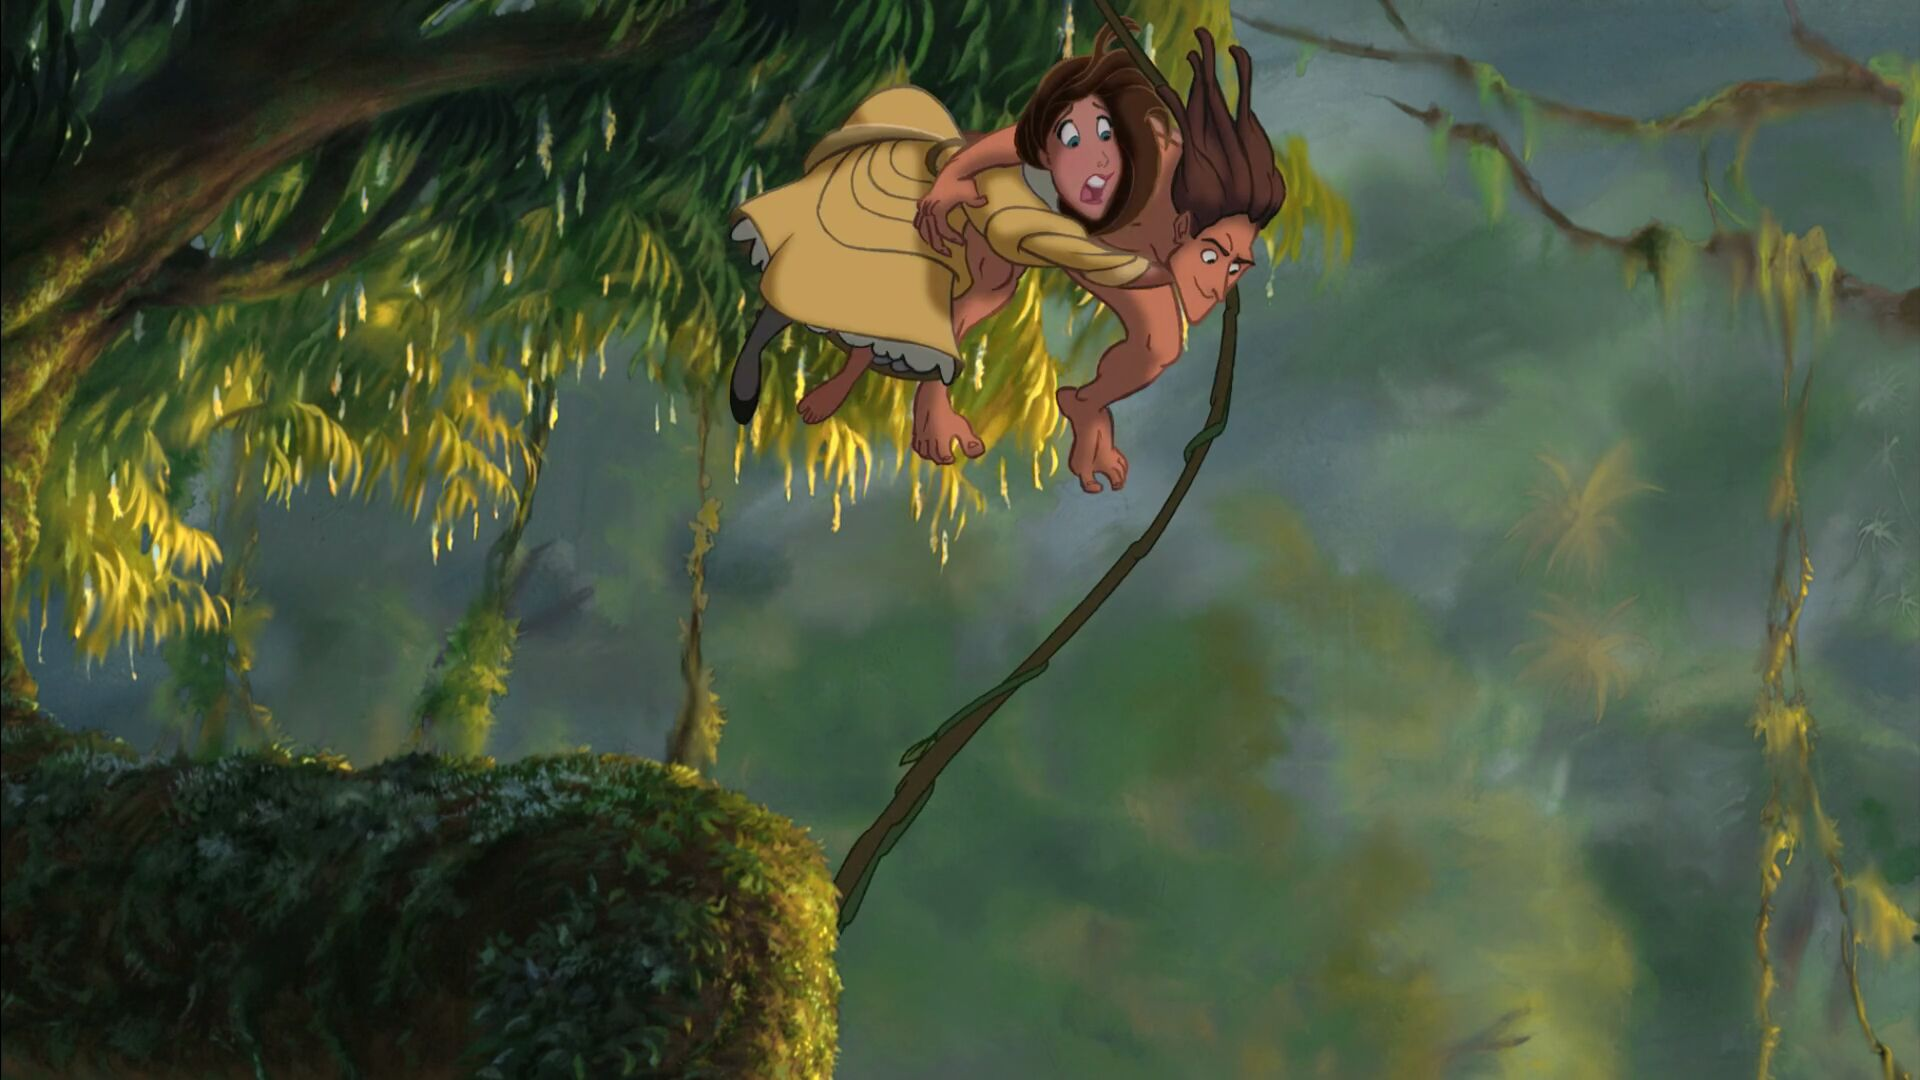 Tarzan 1999 Bdrip 1080p Eng Ita X264 Multisub Shiv 2450949 Walt Disney S Tarzan Photo 41252728 Fanpop